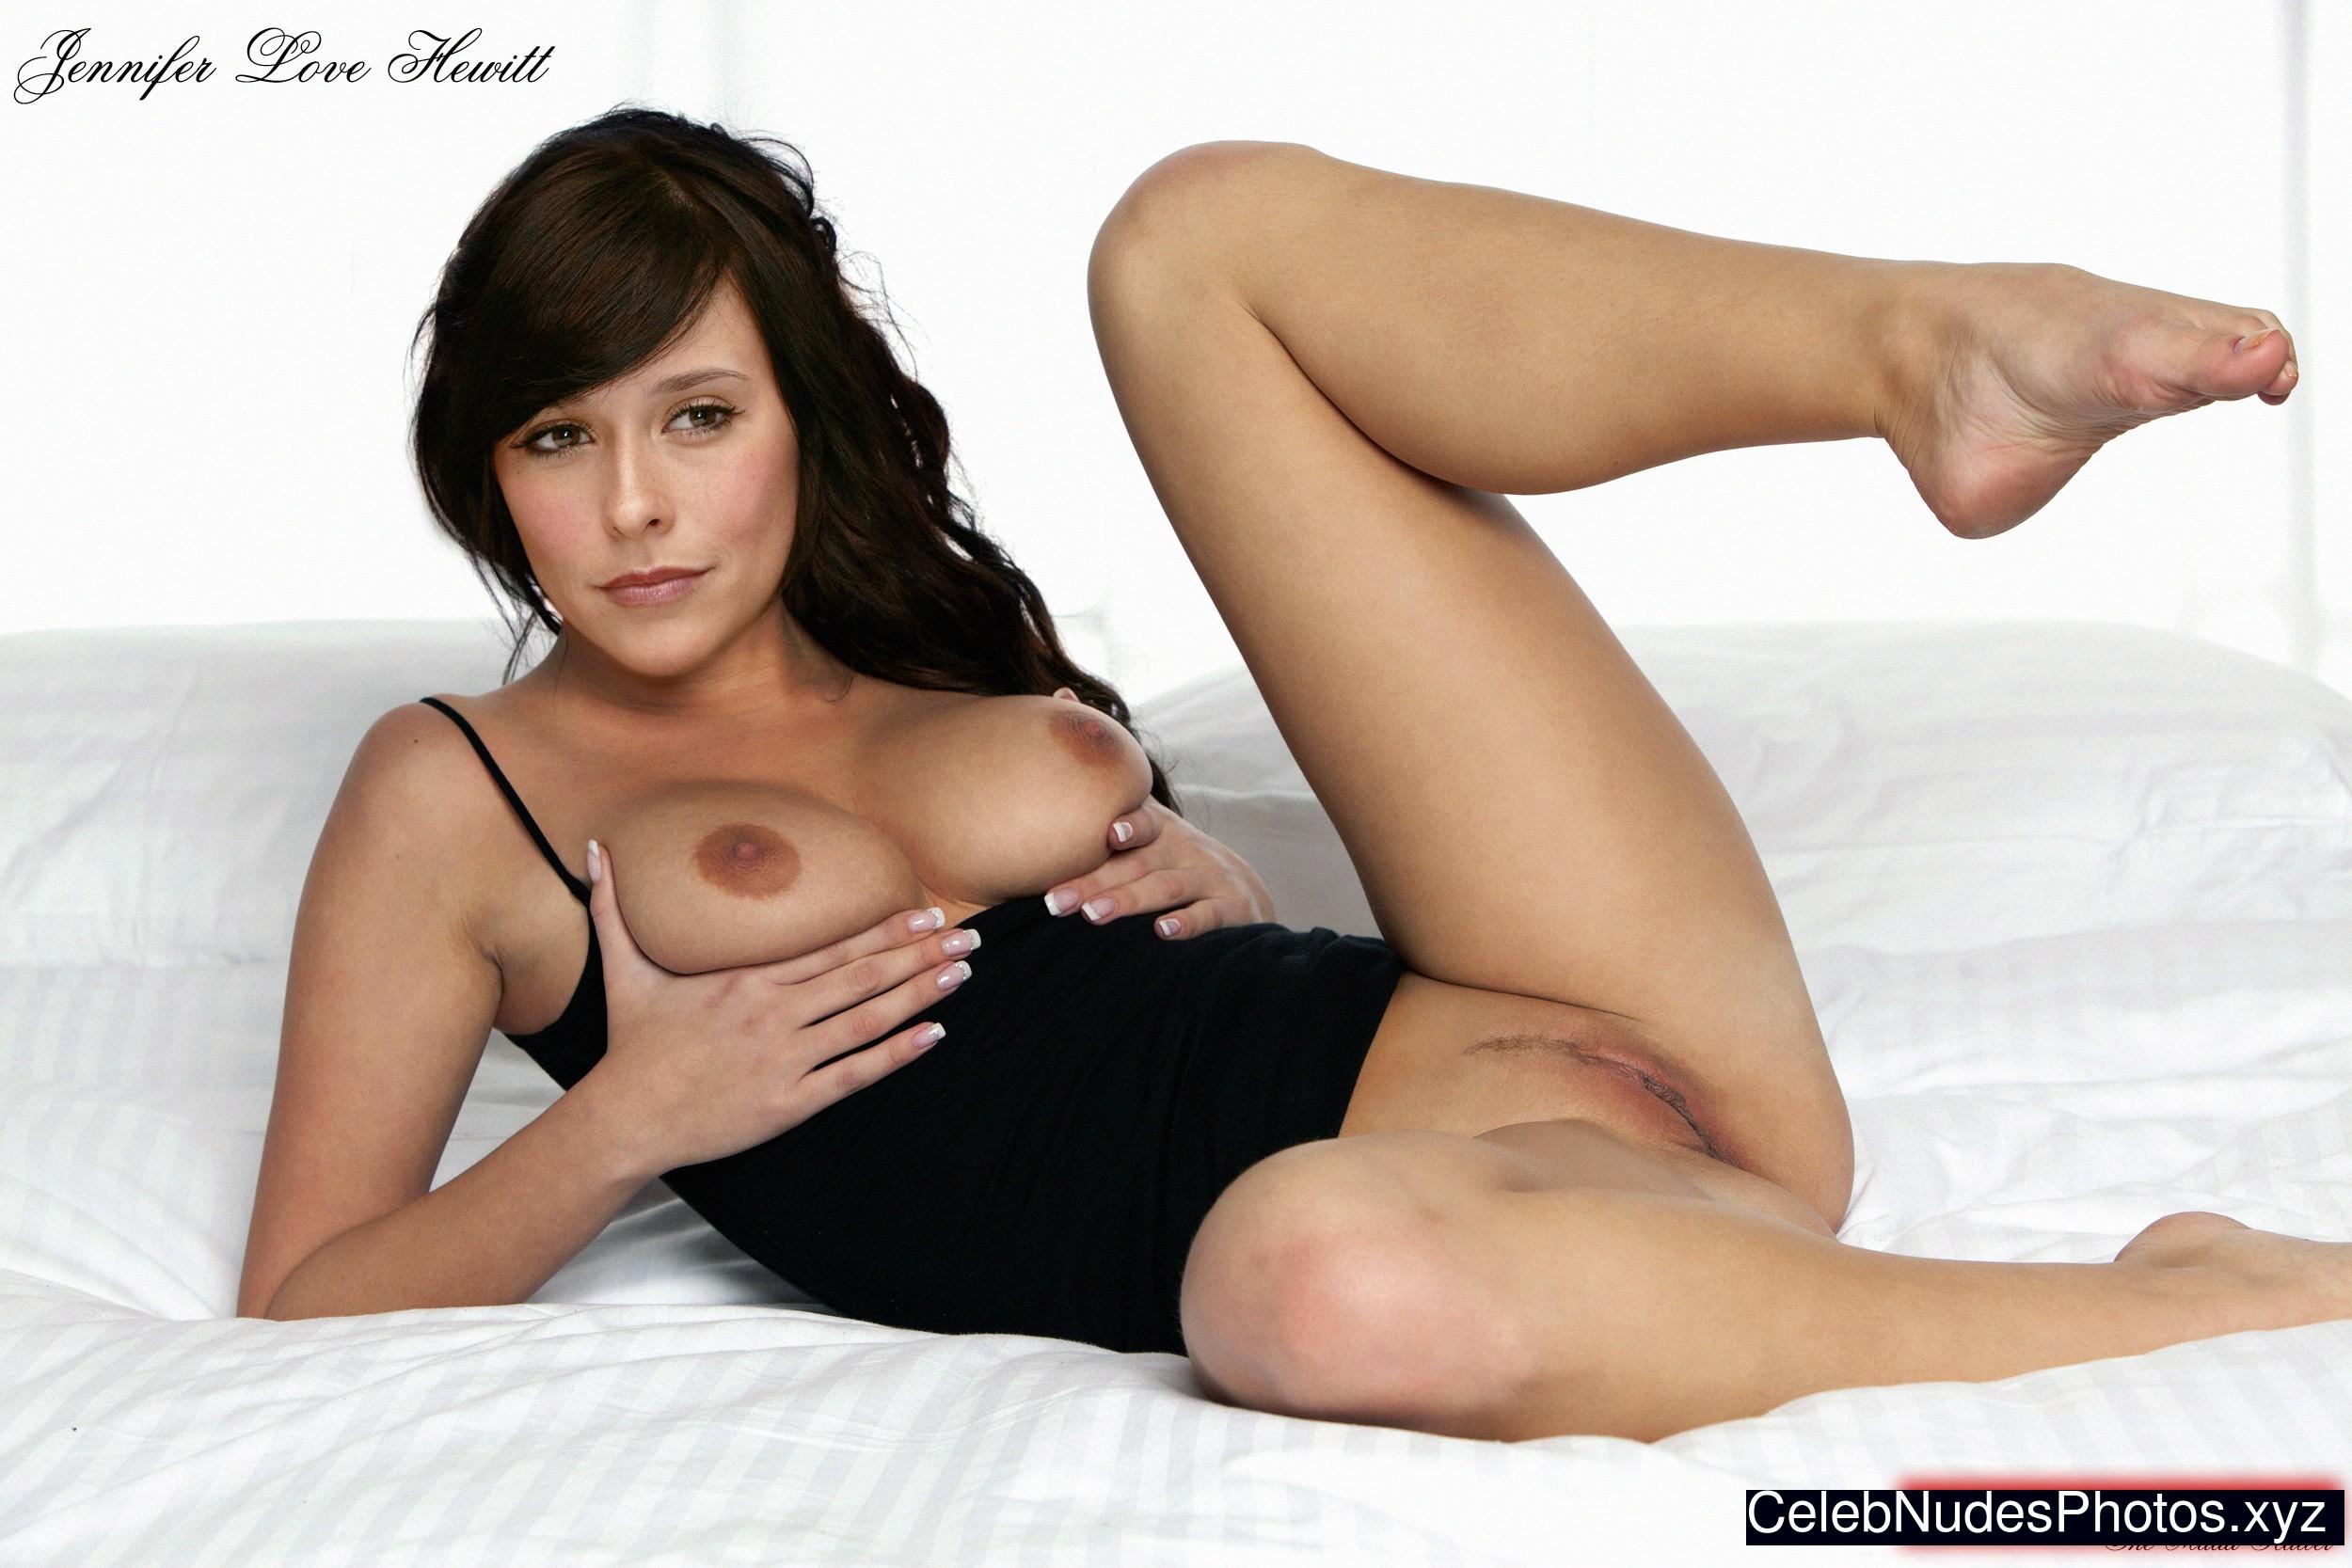 Jennifer Love Hewitt Celeb Nude sexy 20